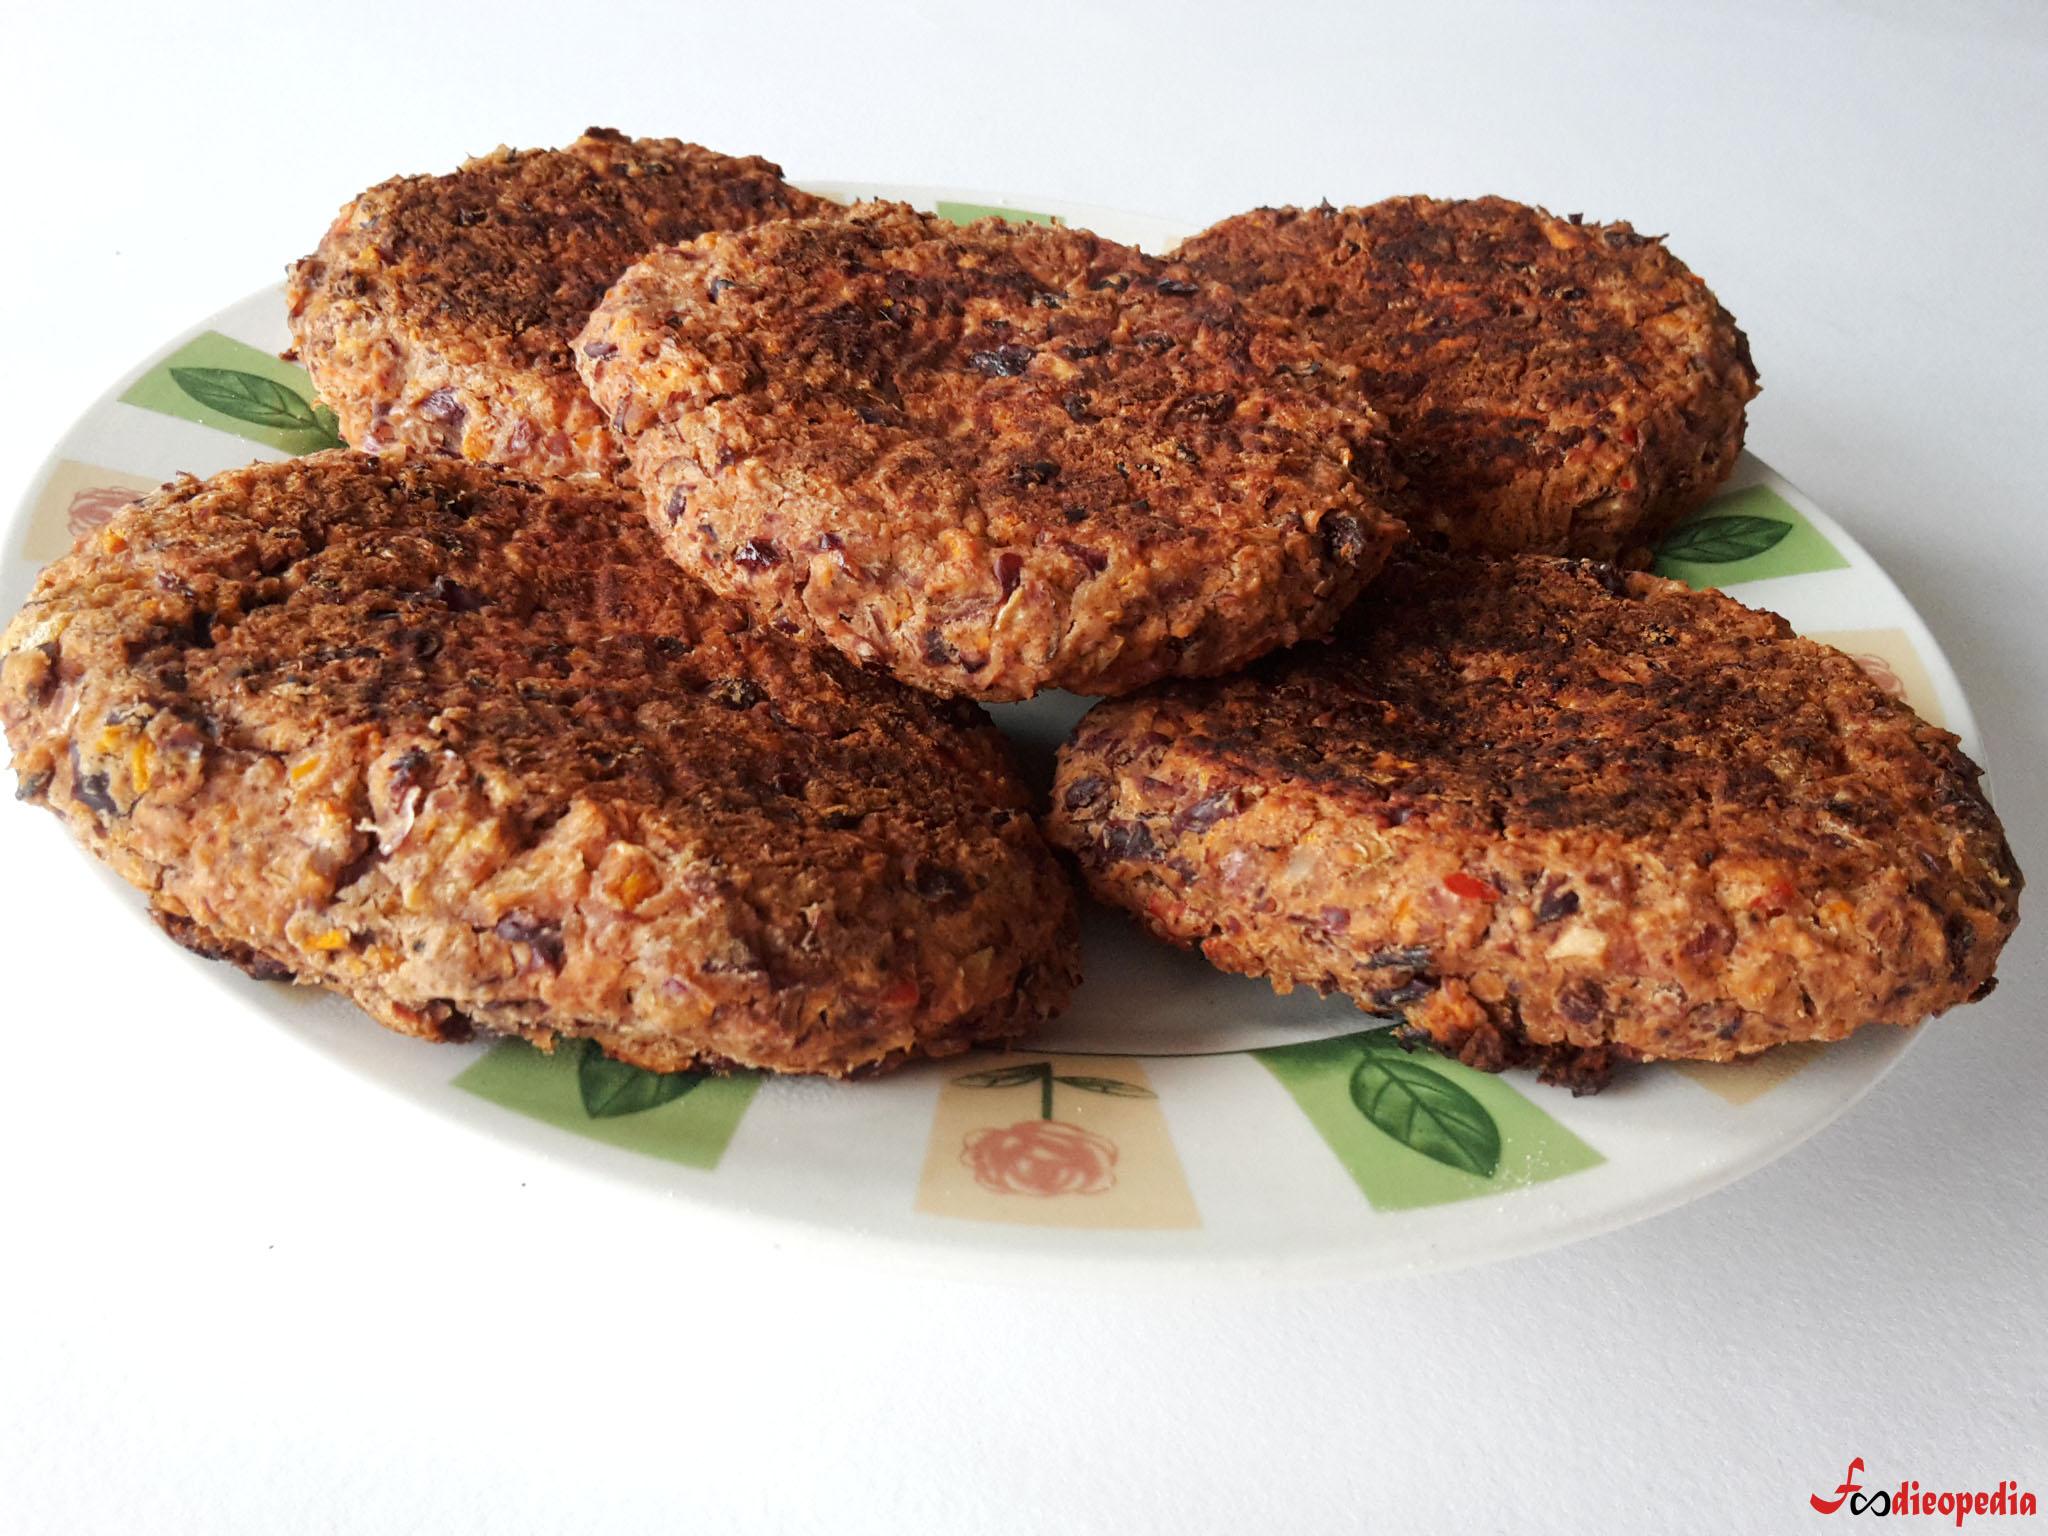 burgeri vegetali din fasole roșie